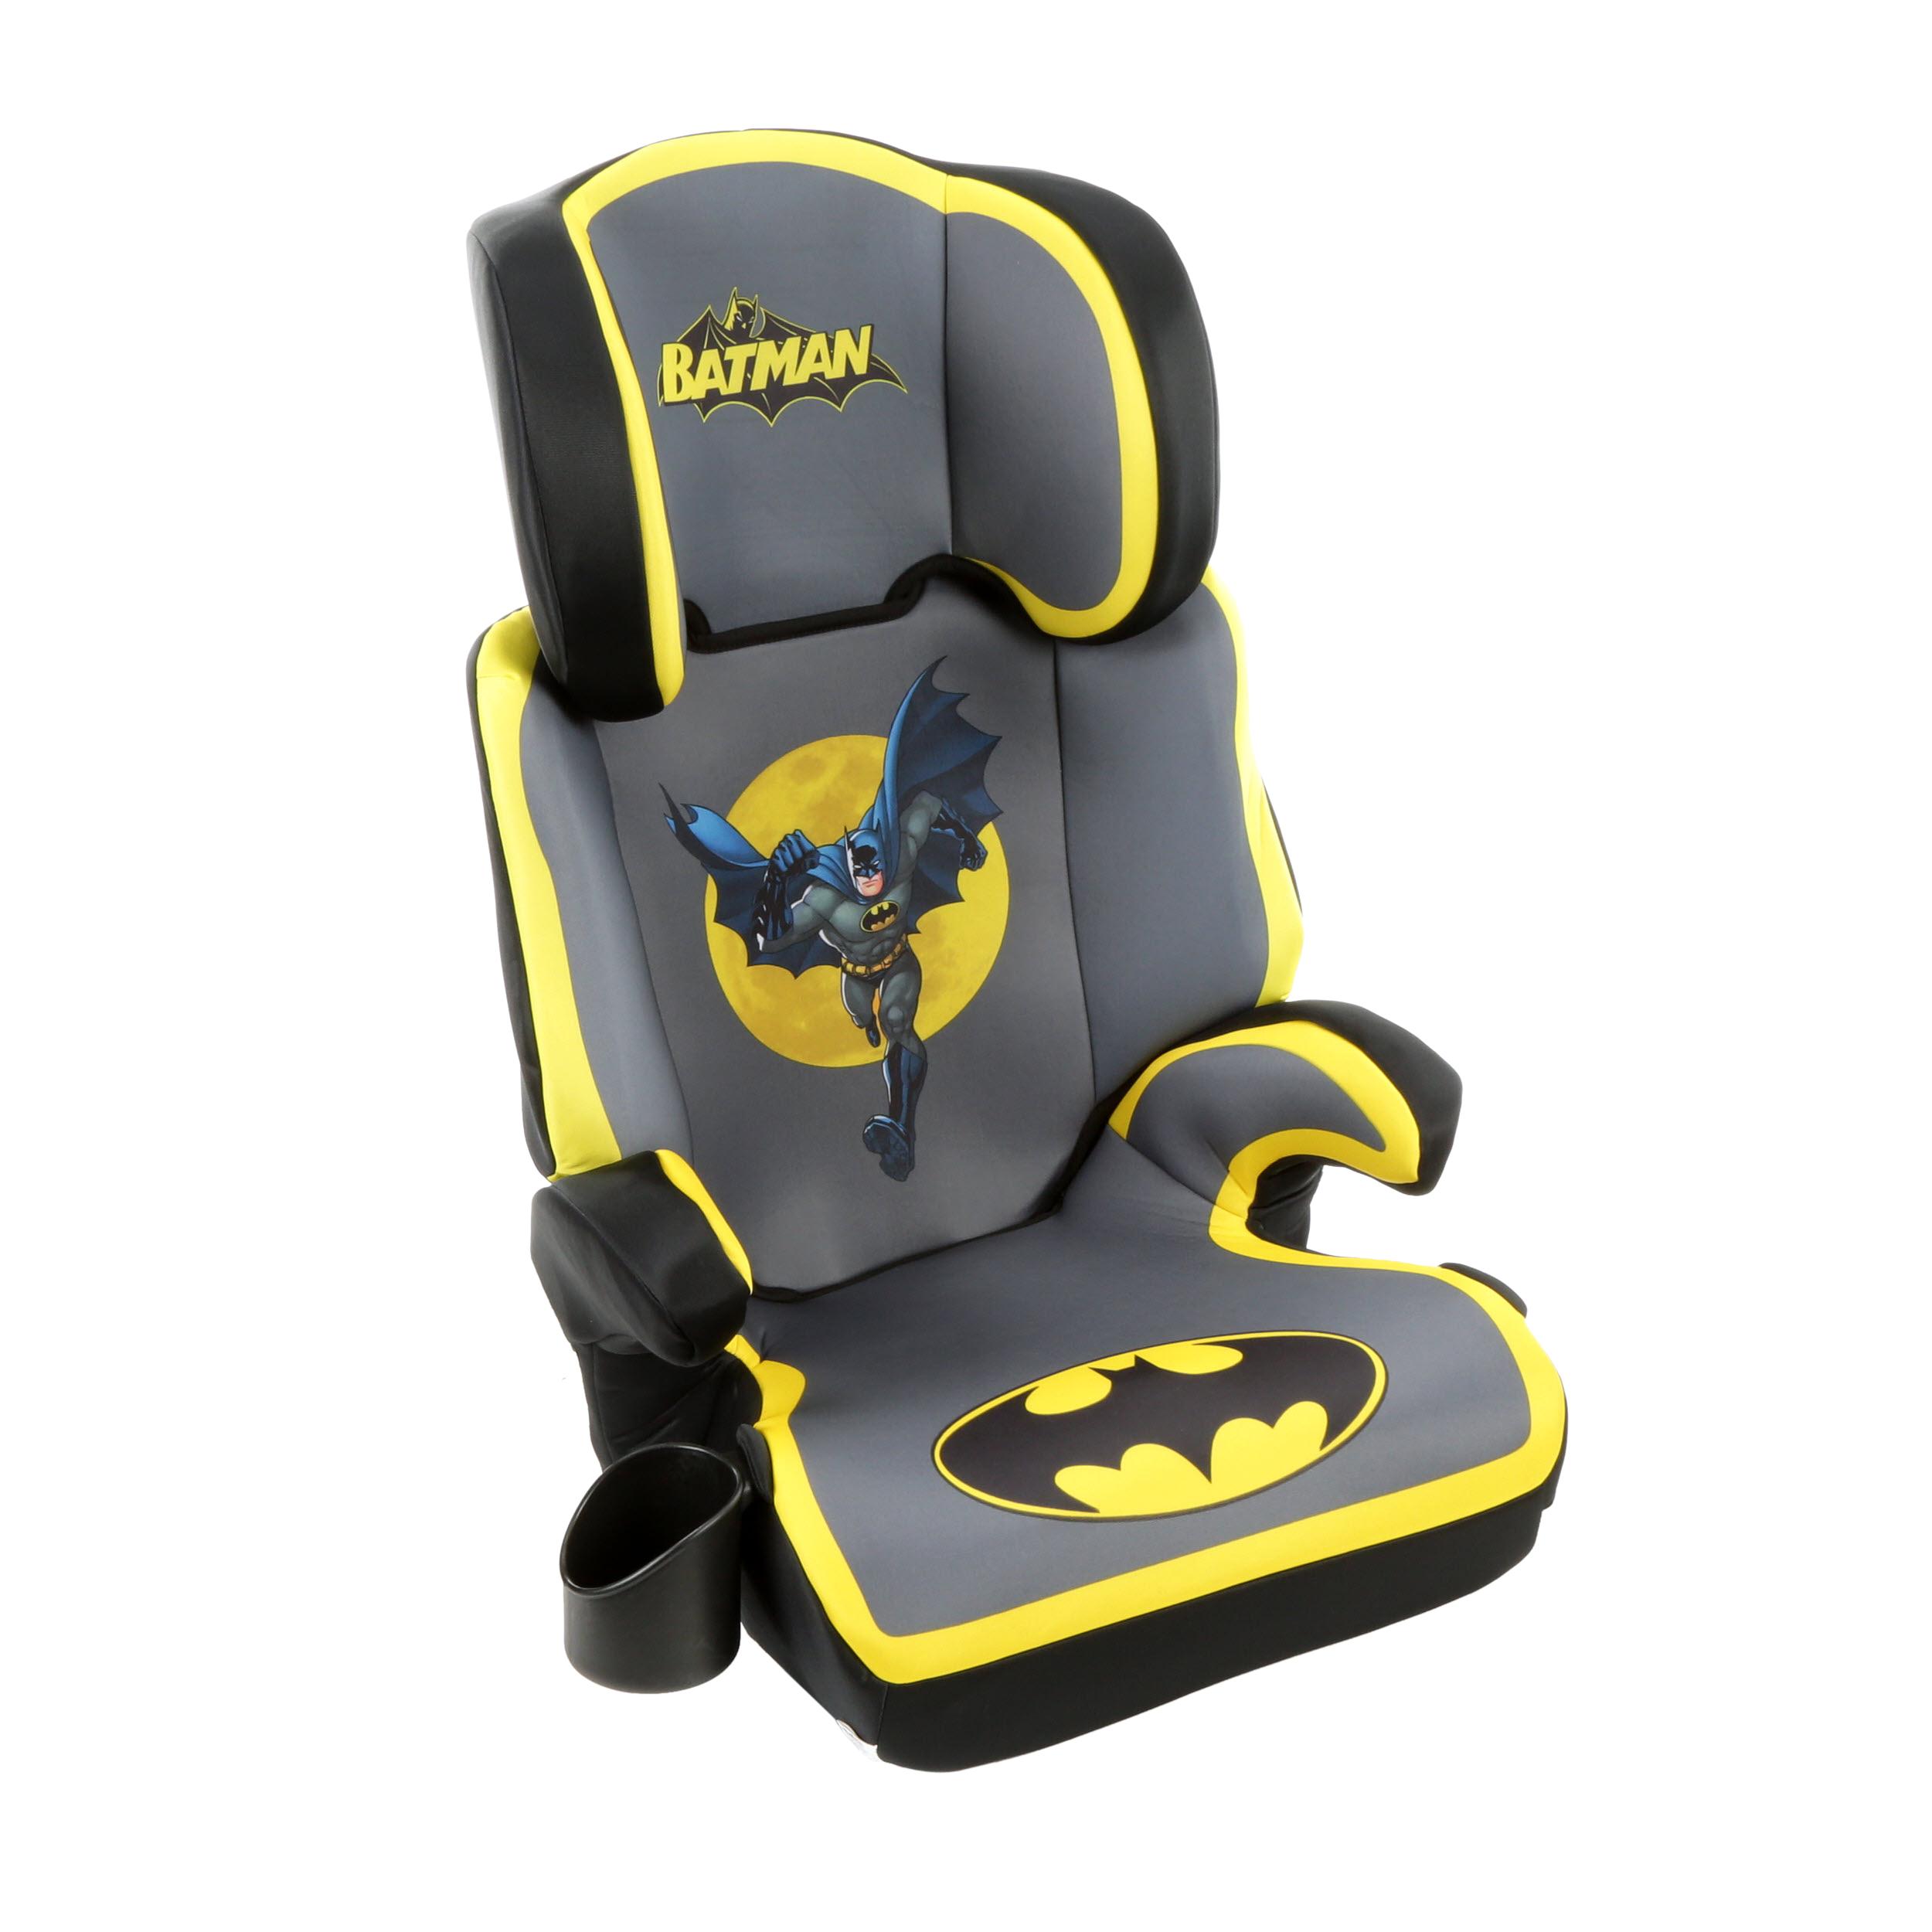 KidsEmbrace DC Comics Batman High Back Booster Car Seat